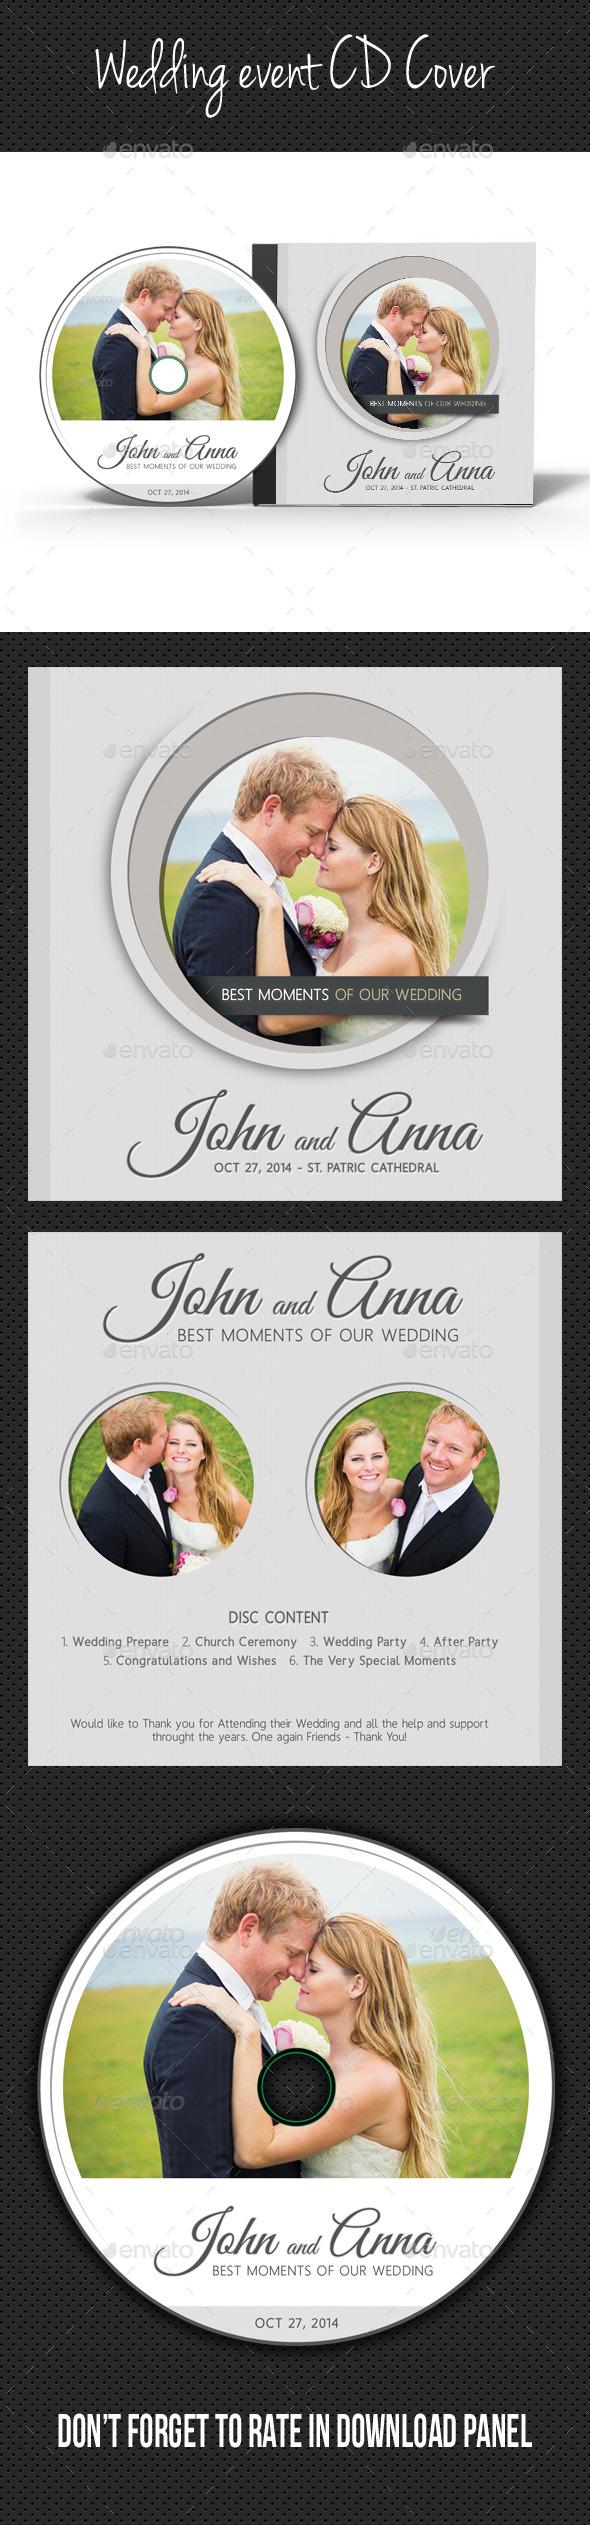 Wedding Event CD Cover V12 - CD & DVD Artwork Print Templates